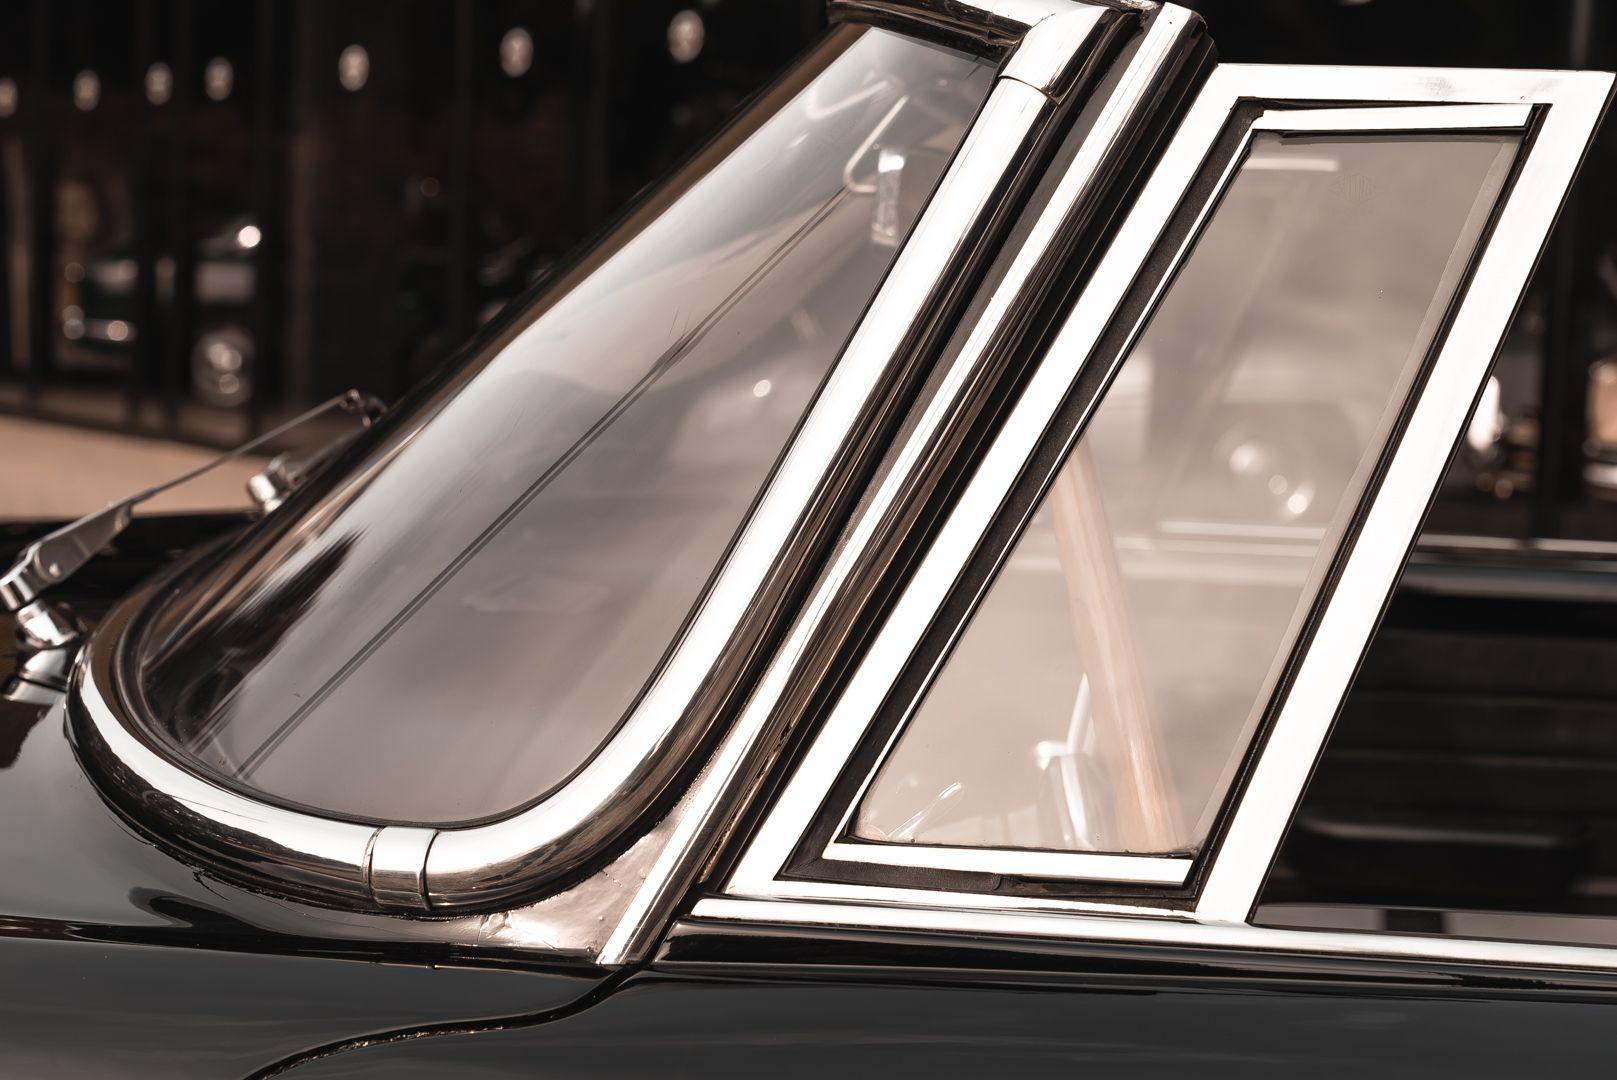 1968 Lancia Flaminia Touring Convertible 2800 3C 79142